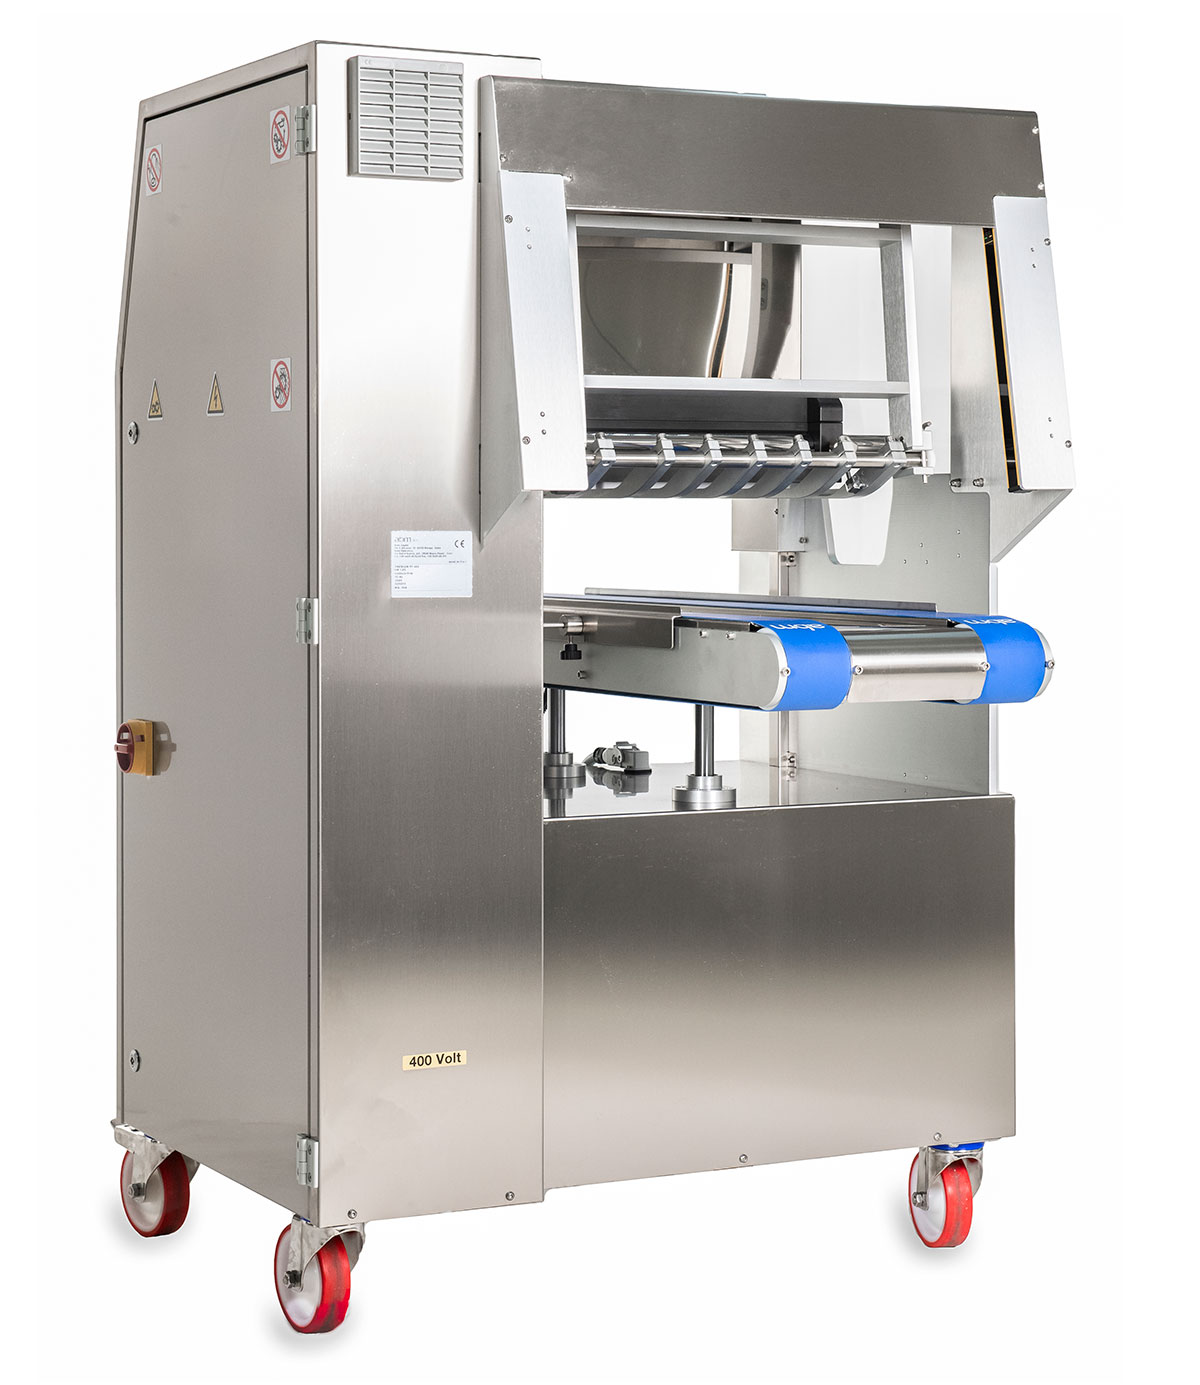 Colatrice biscotti premium Tf400 side b